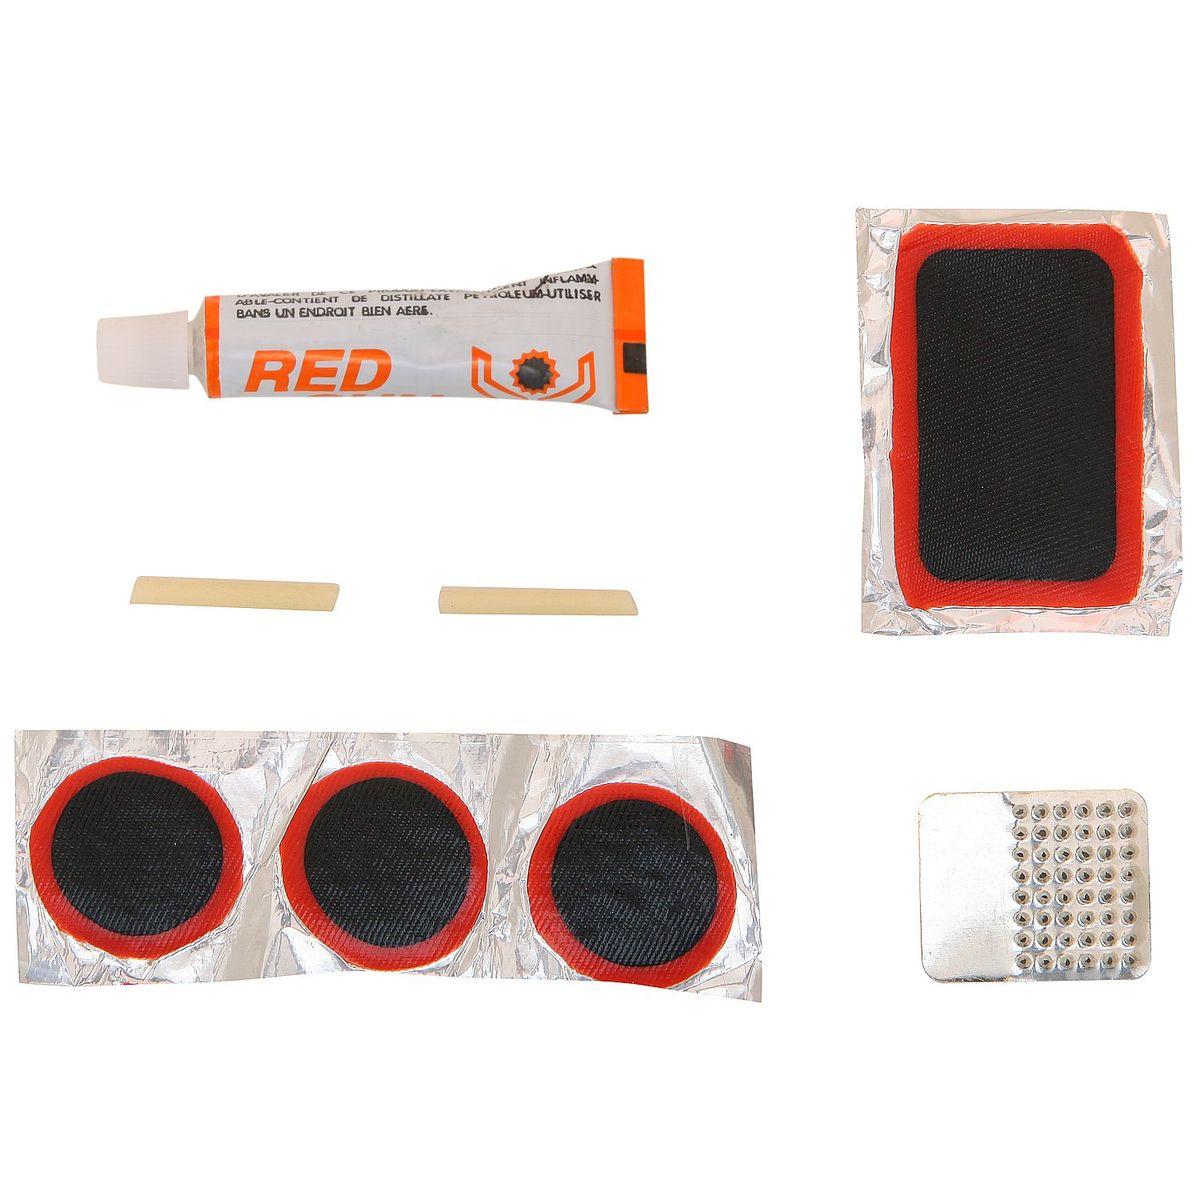 Аптечка для ремонта камер STG T35003. Х33238-5Х33238-5Велоаптечка для ремонта камер